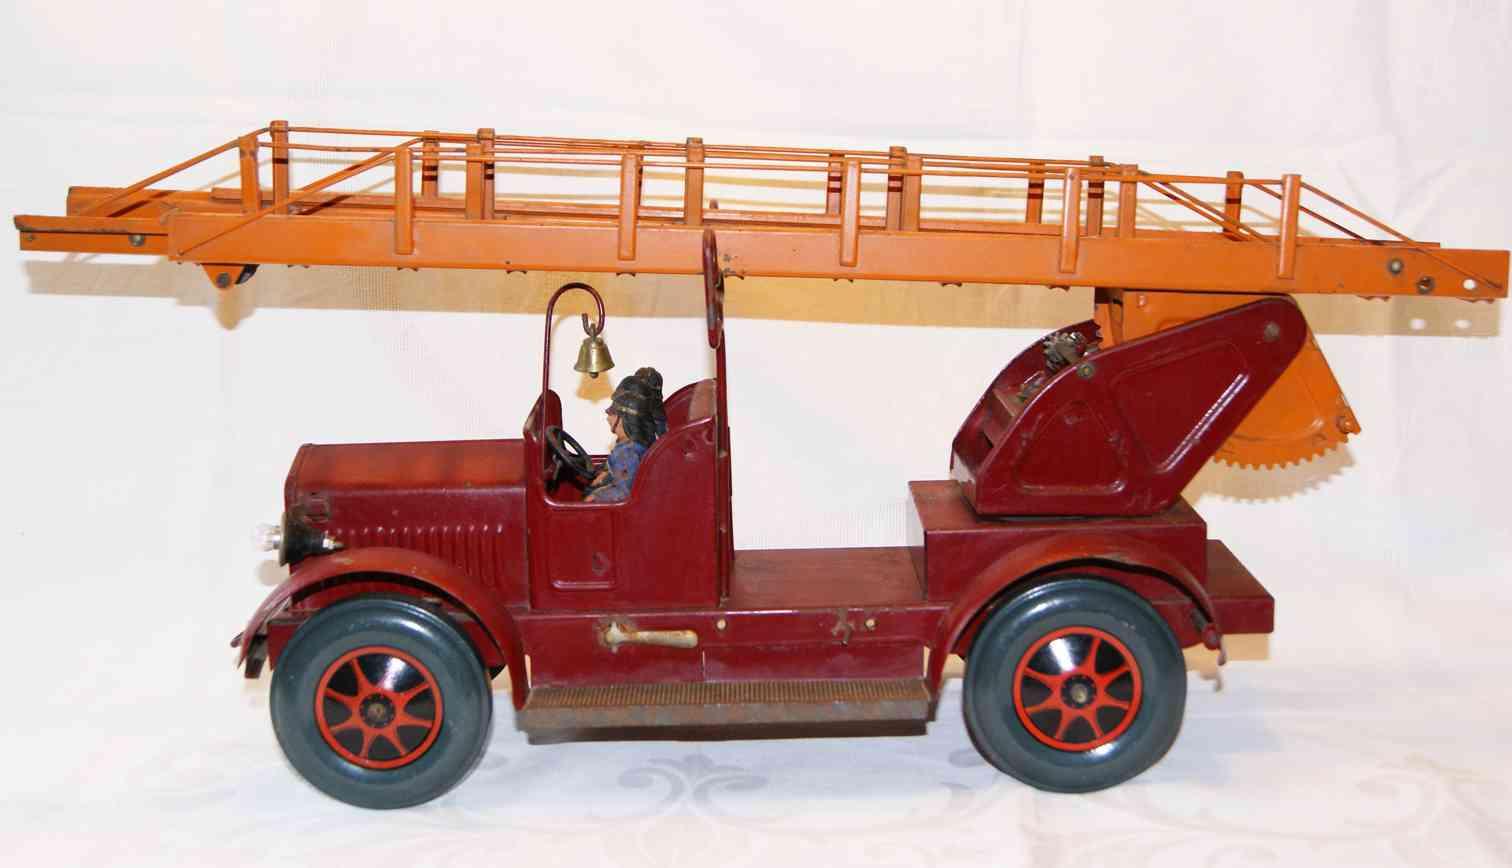 karl bub 3005/1b tin toy fire engine fire brigade ladder truck 3 men 3005f